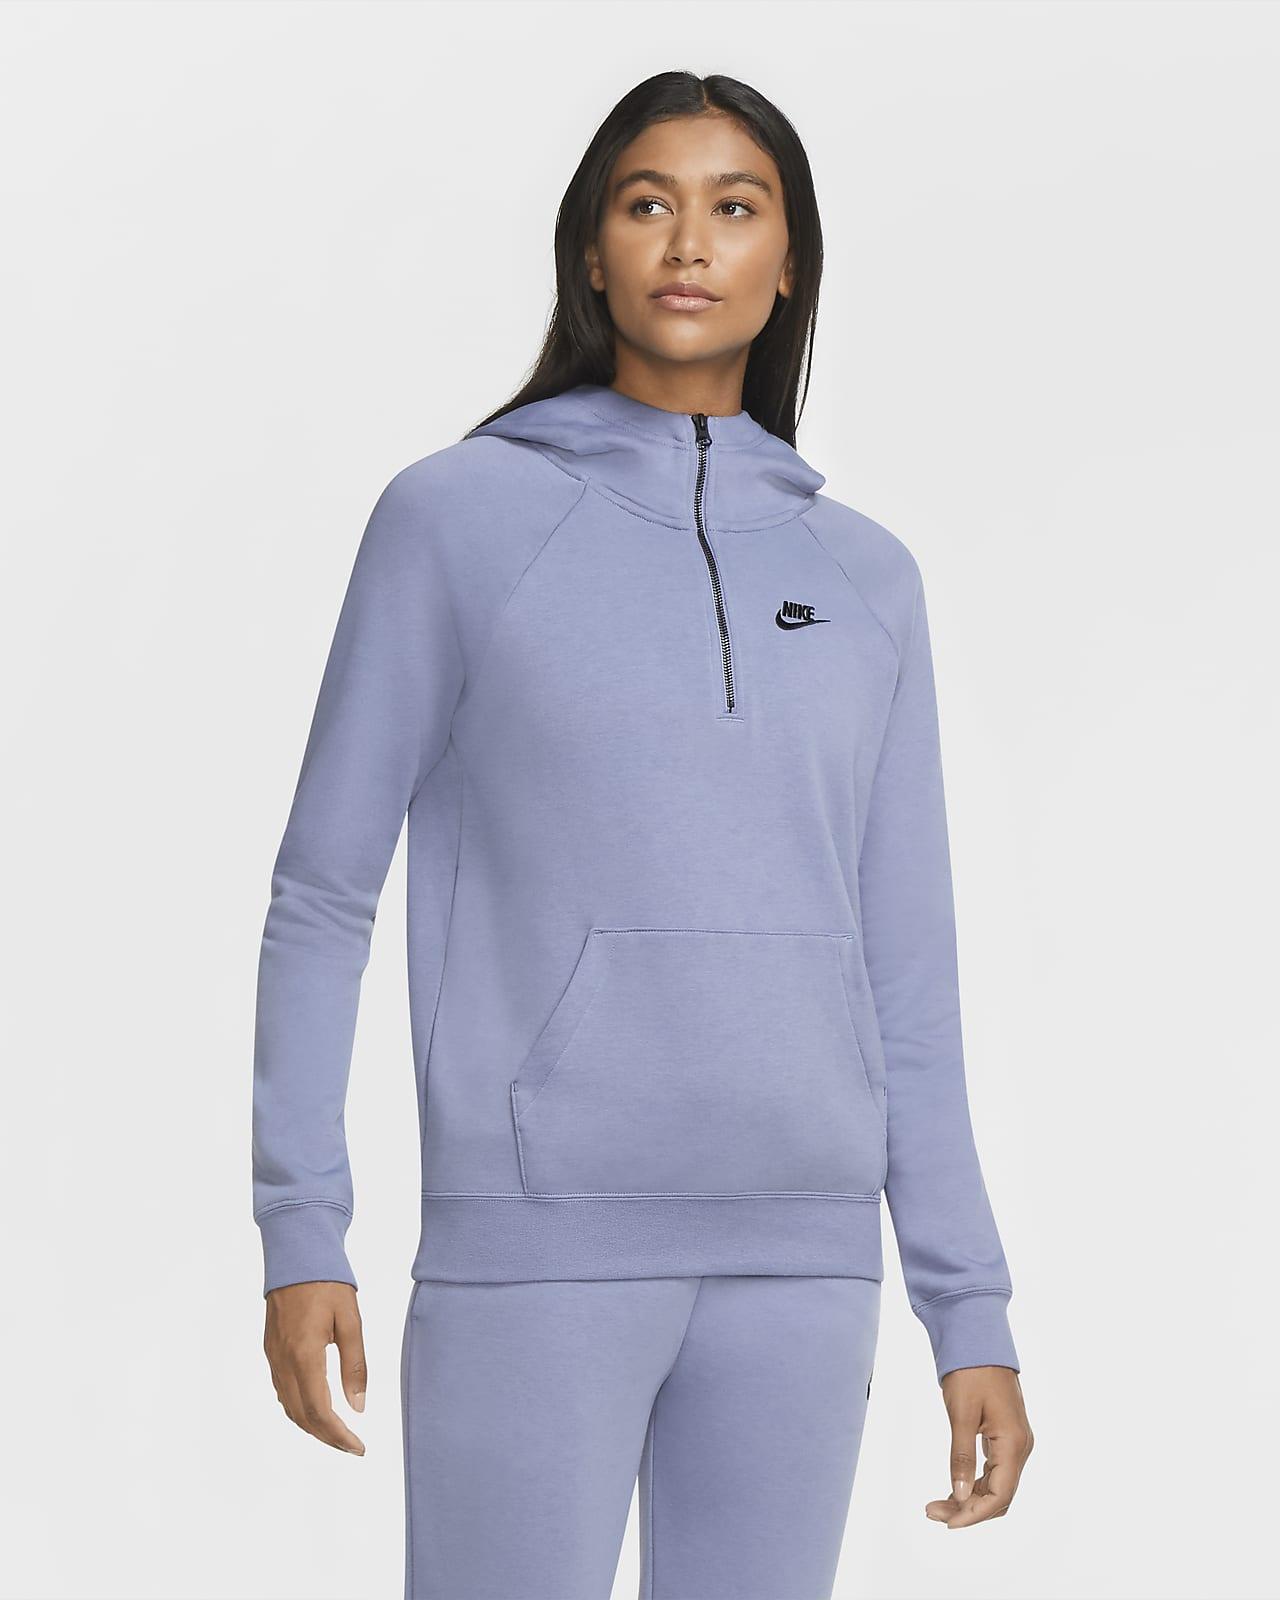 Nike Sportswear Essential Women's 1/4-Zip Hoodie